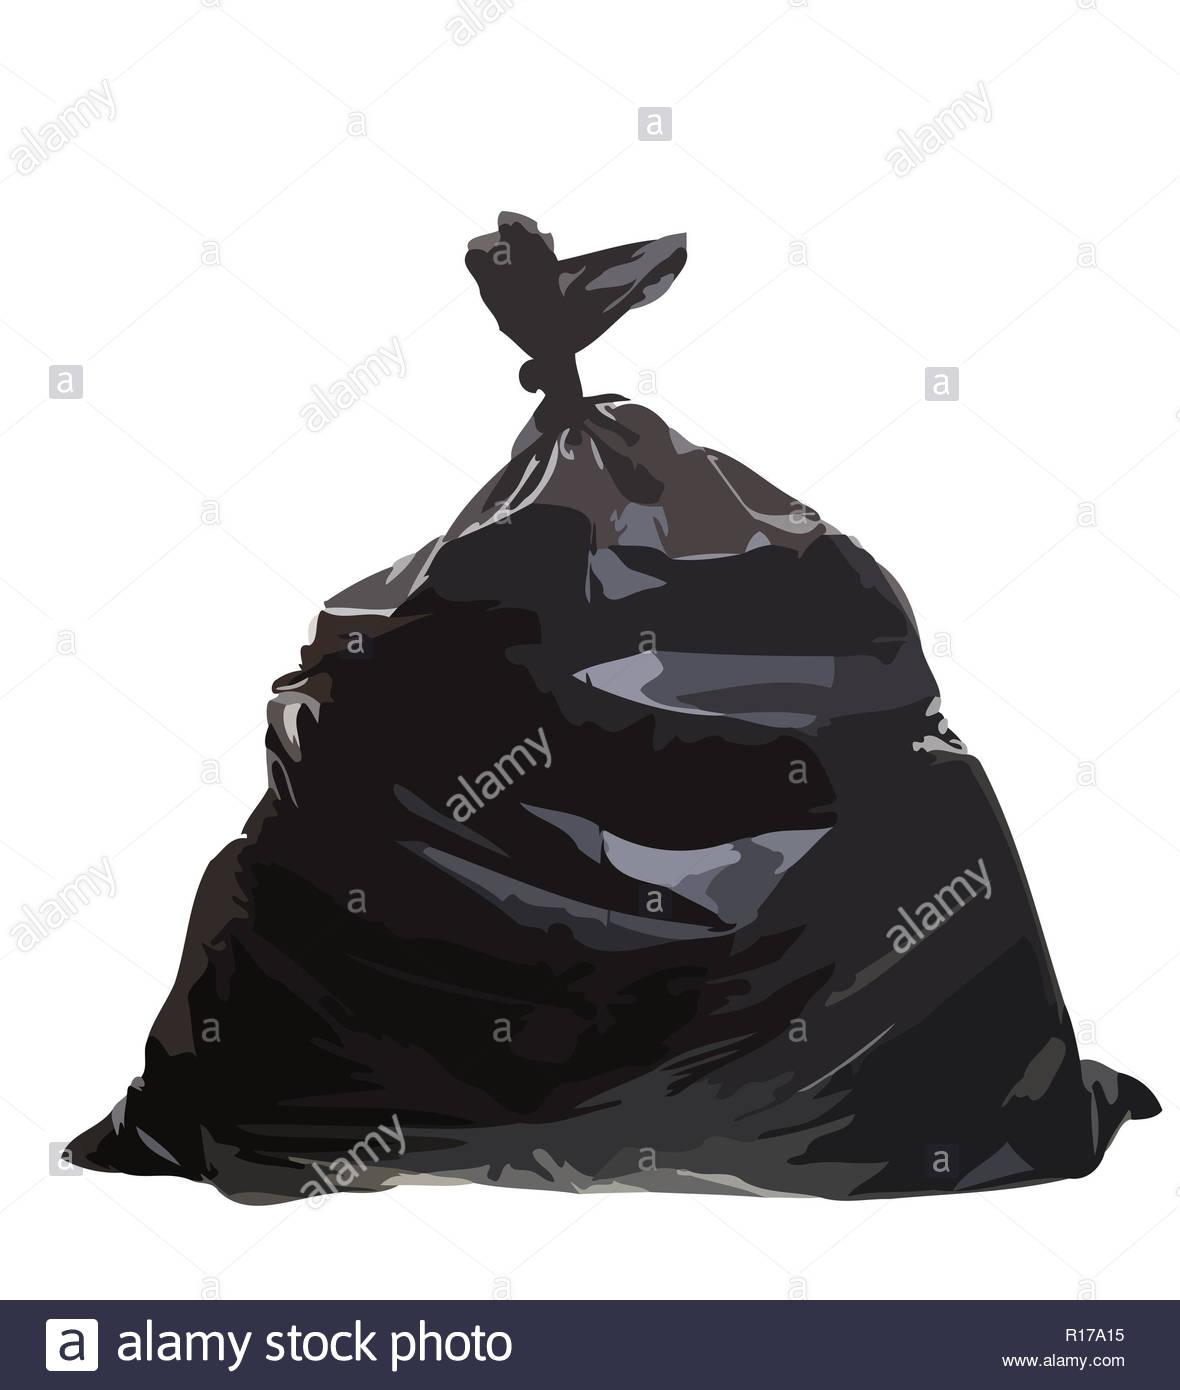 plastic bag rubbish garbage black junk trash illustration - Stock Image